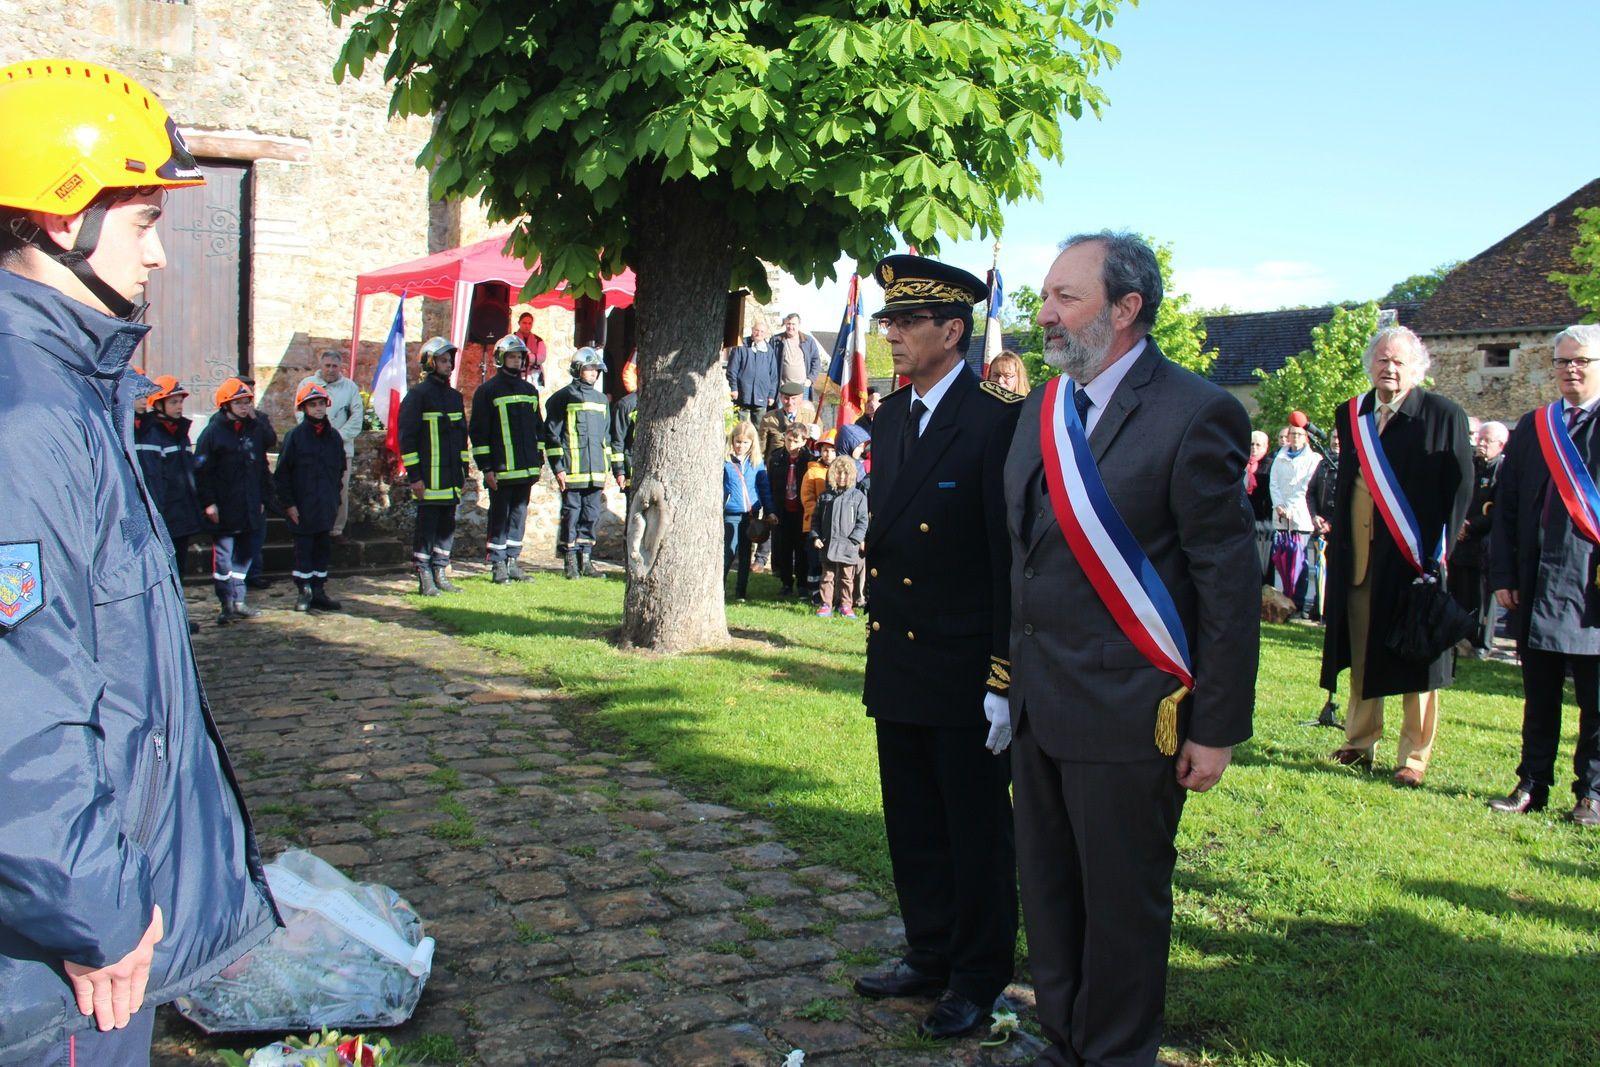 HOMMAGE AU Colonel Arnaud Beltrame